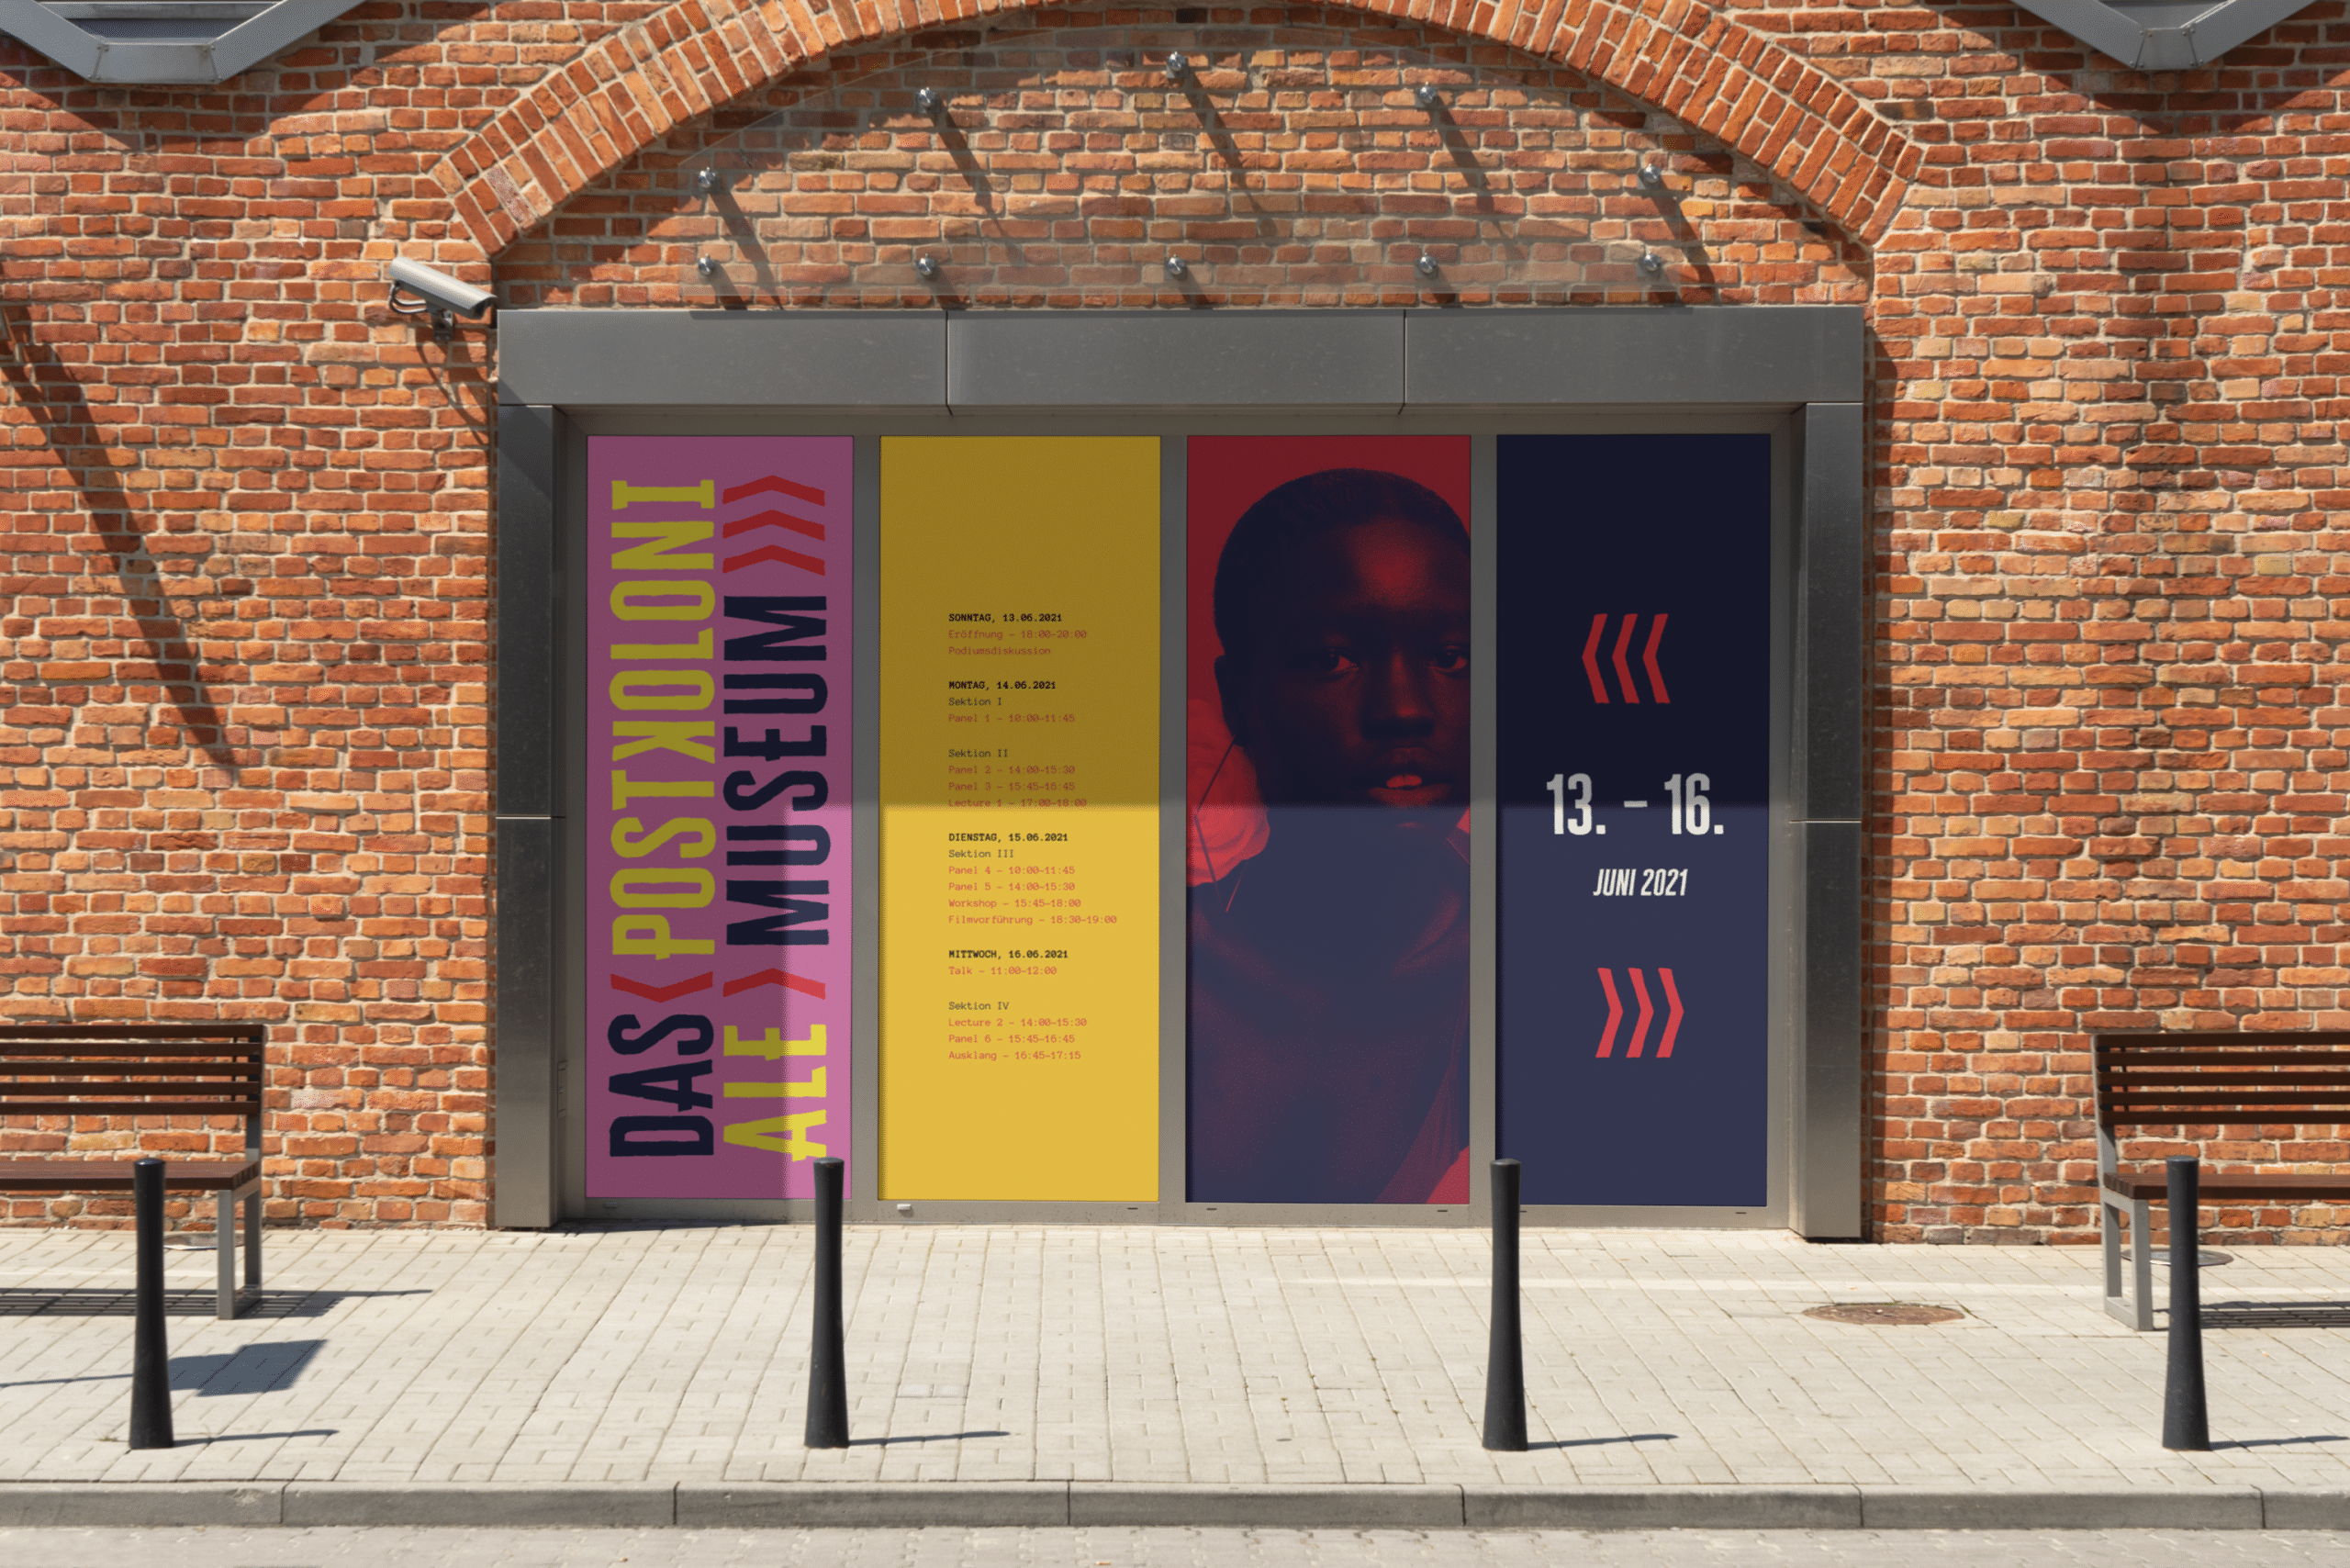 SHMH-Das-Postkoloniale-Museum-Stiftung-Historische-Museen-Hamburg-mimosa-agency-36